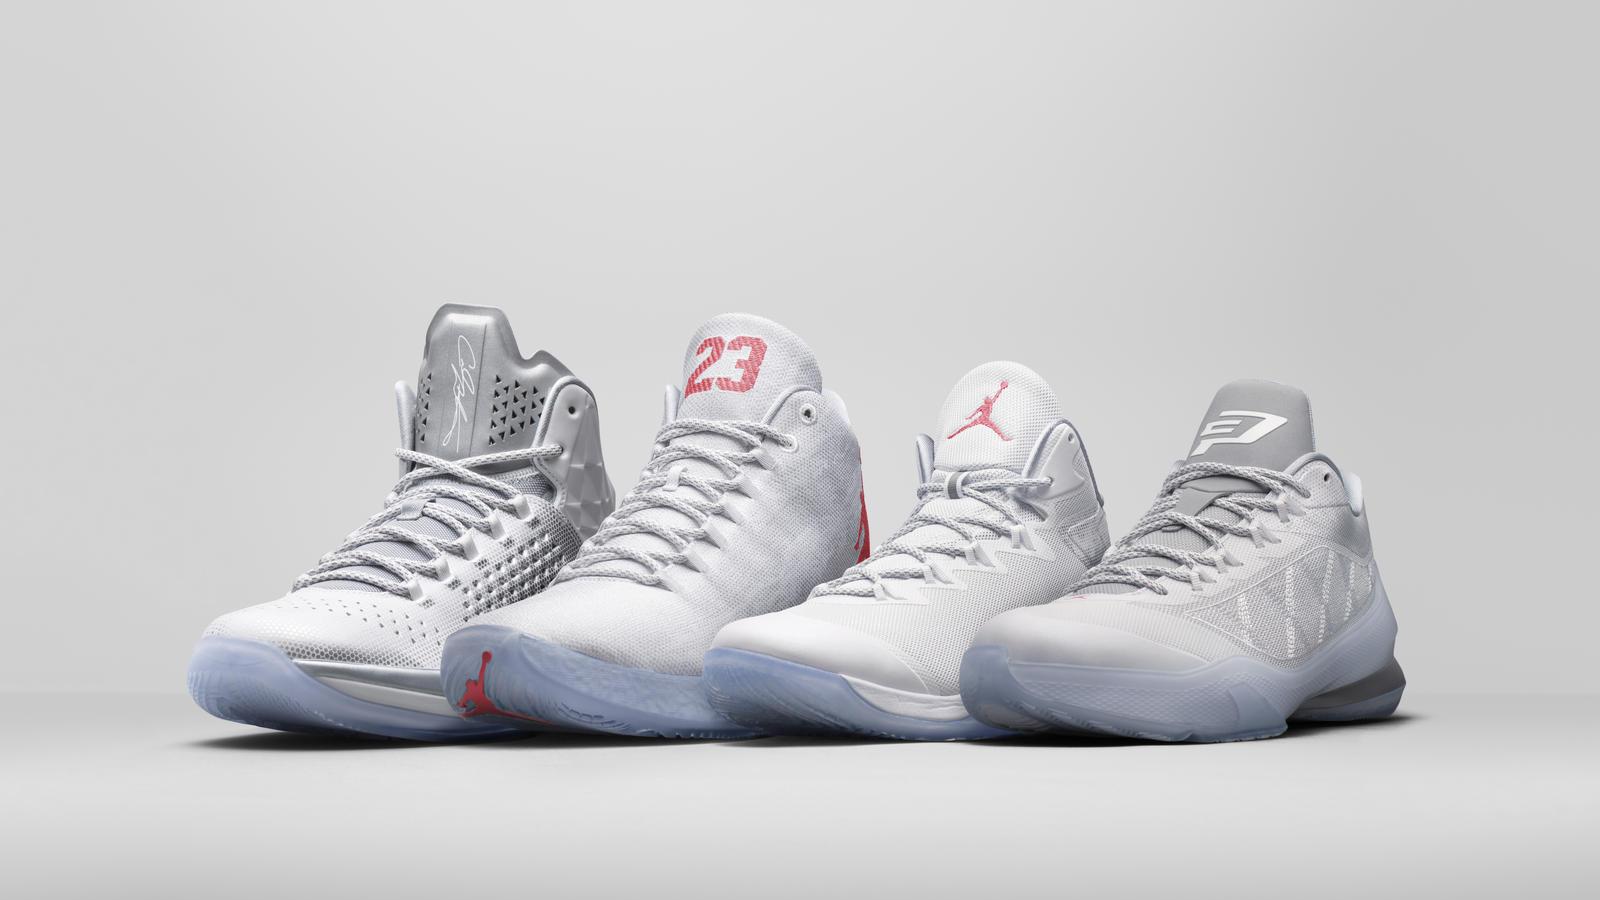 cf9955445ae discount jordan cp3.ix hornets 6cf3f c0d28  usa jordan unveils player  exclusive footwear for all star 4f19c 1f9bb